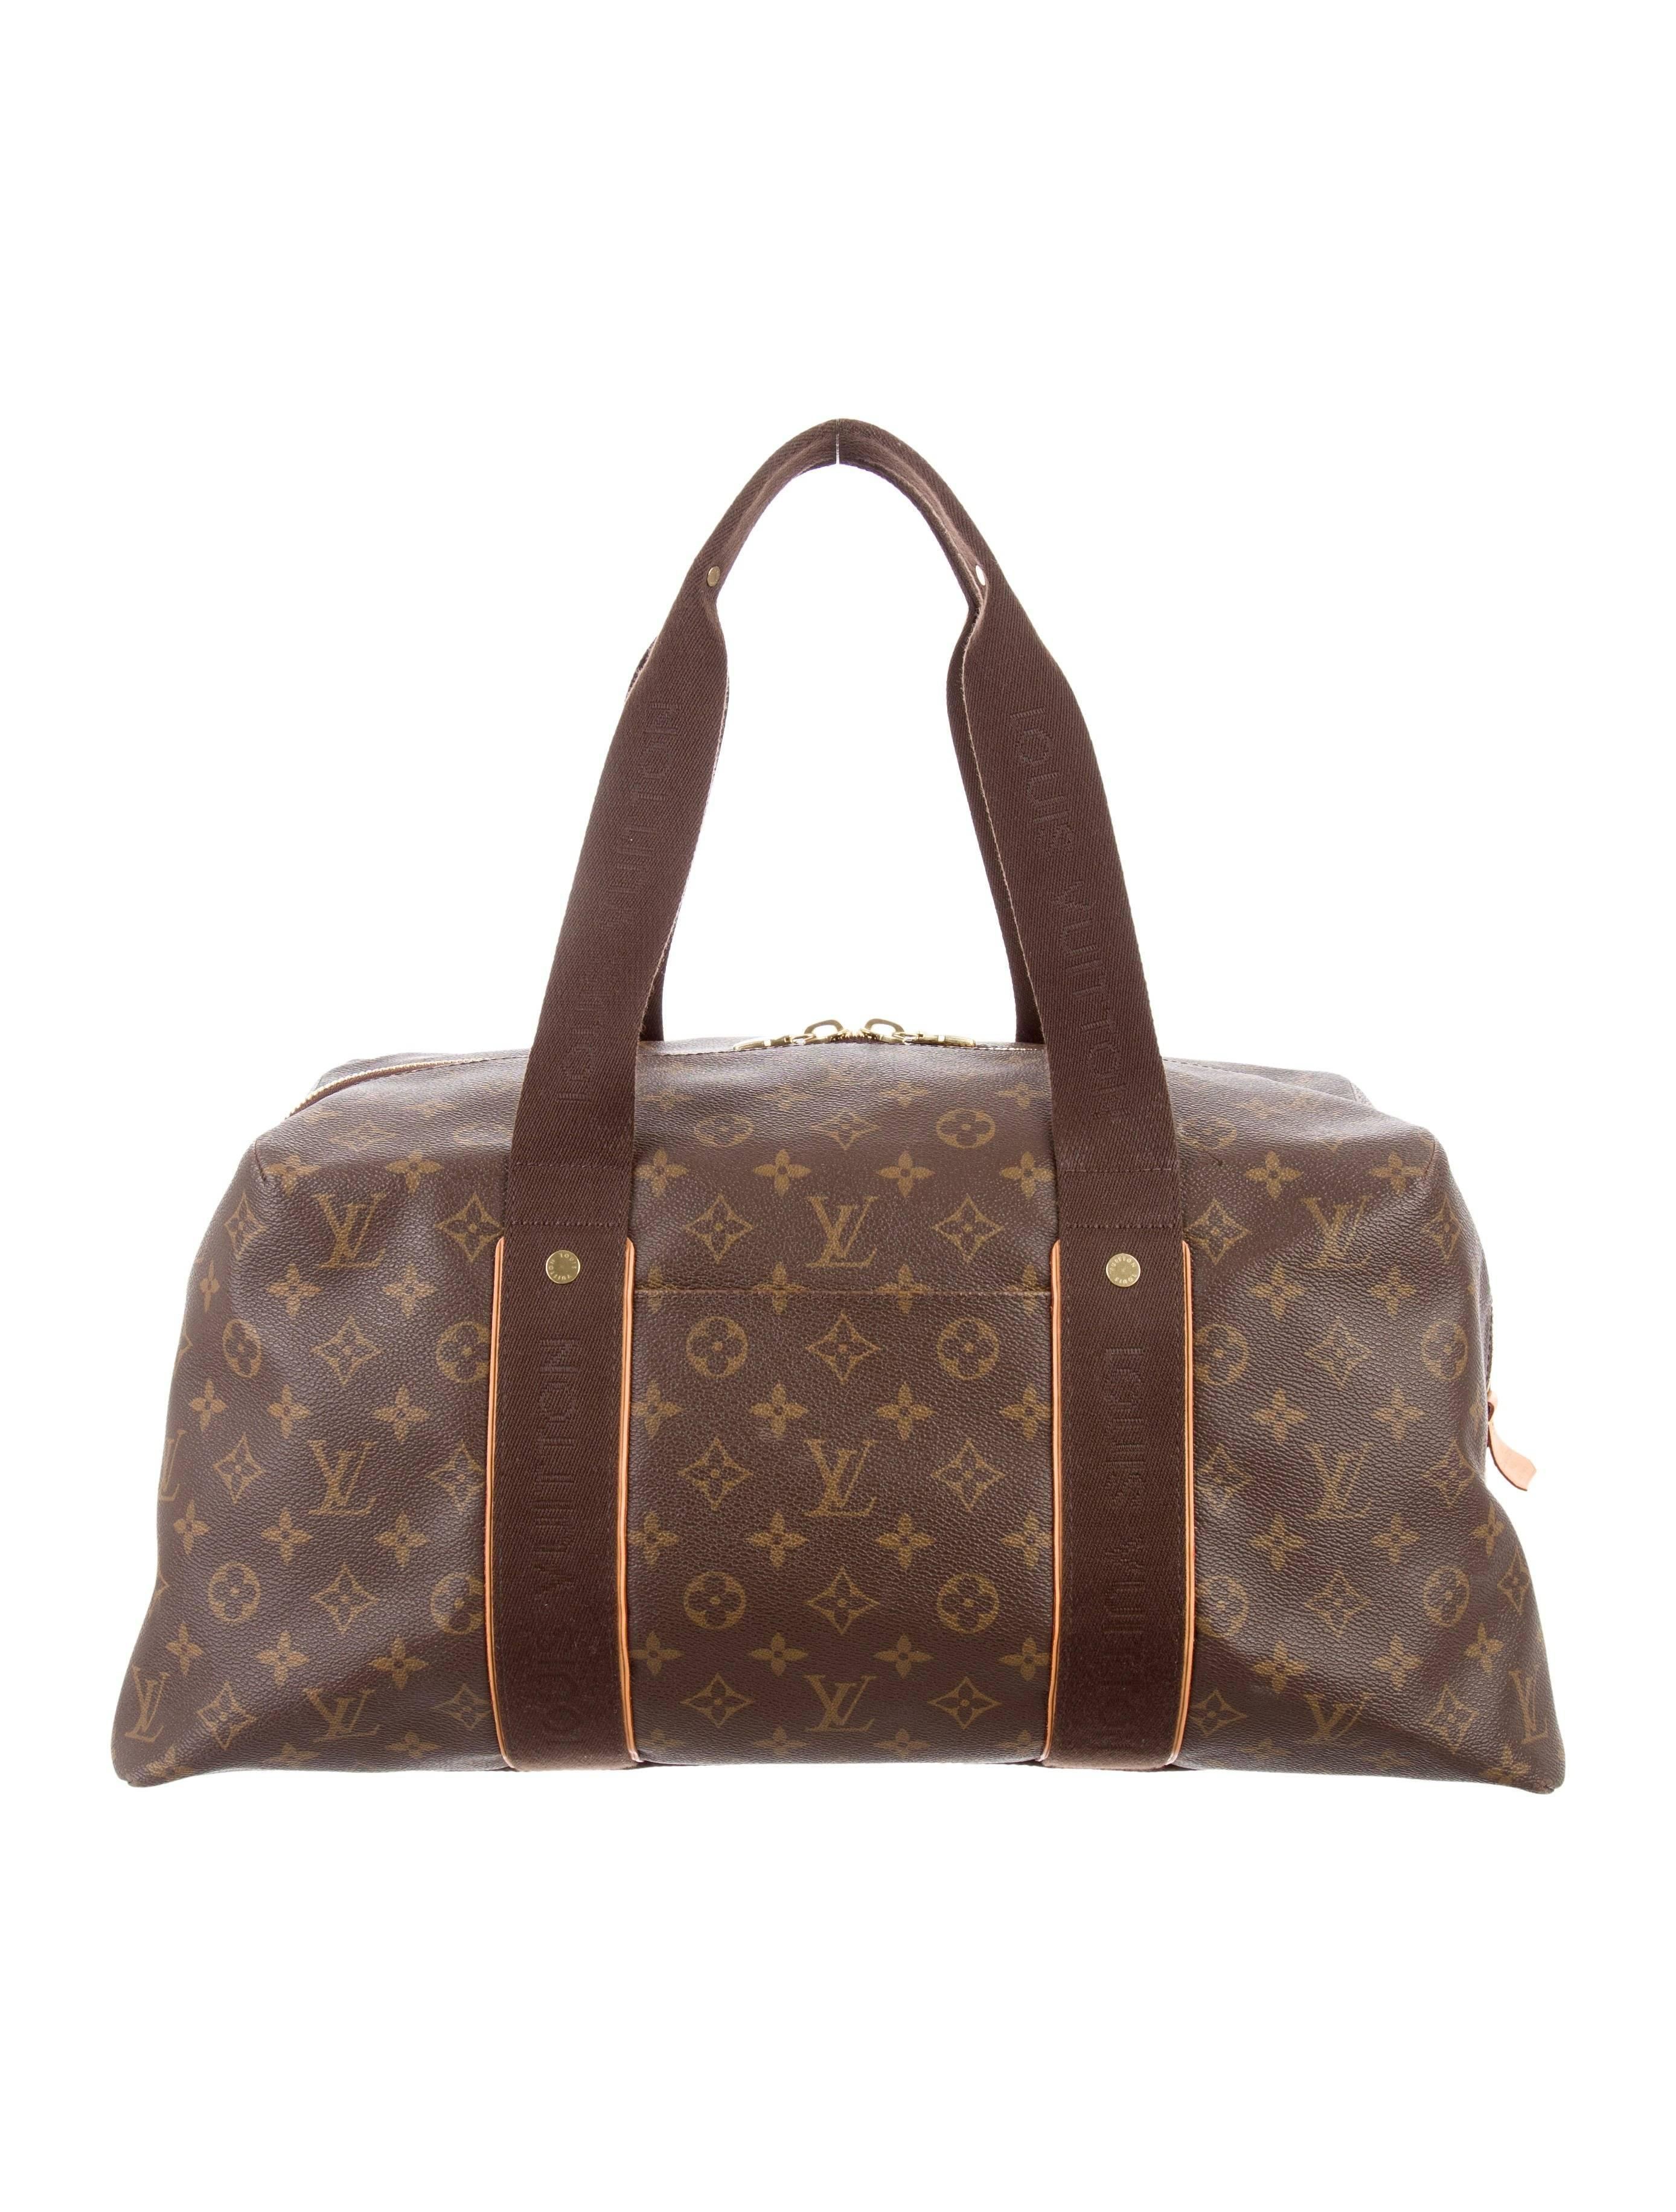 Louis Vuitton Limited Edition Top Handle Mens Travel Weekender Duffle Tote Bag fQPDOA